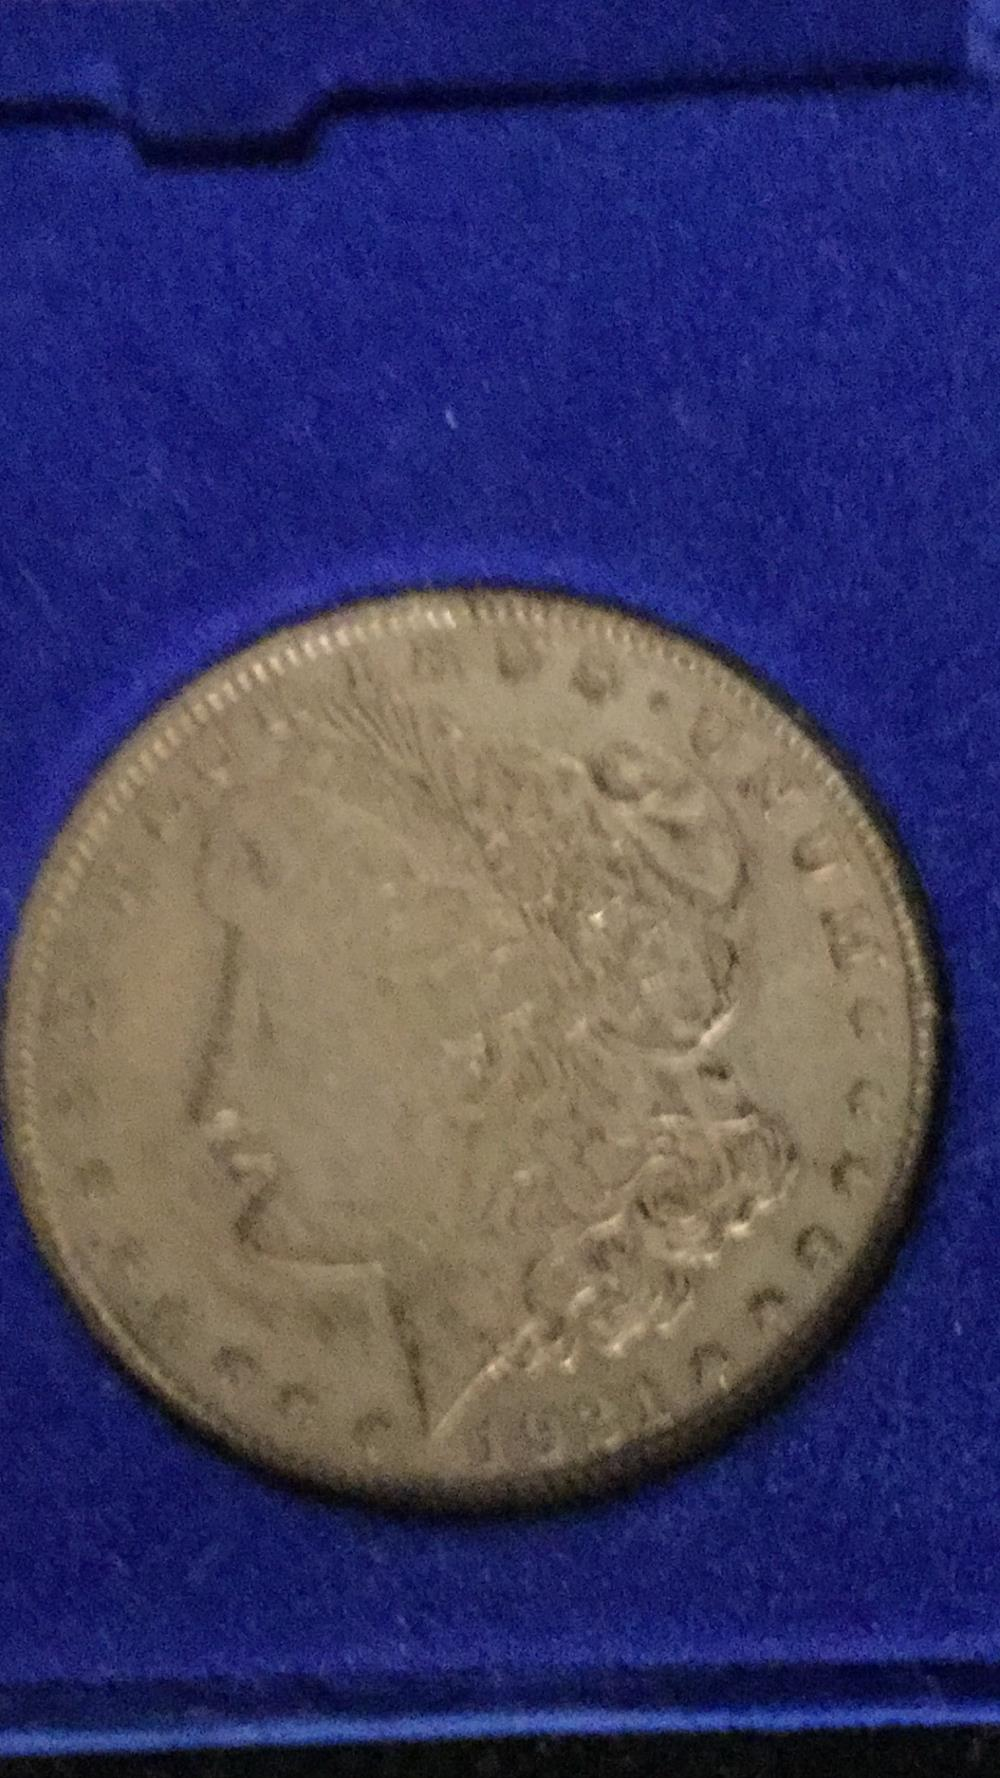 Lot 51: Lady liberty centennial silver dollars